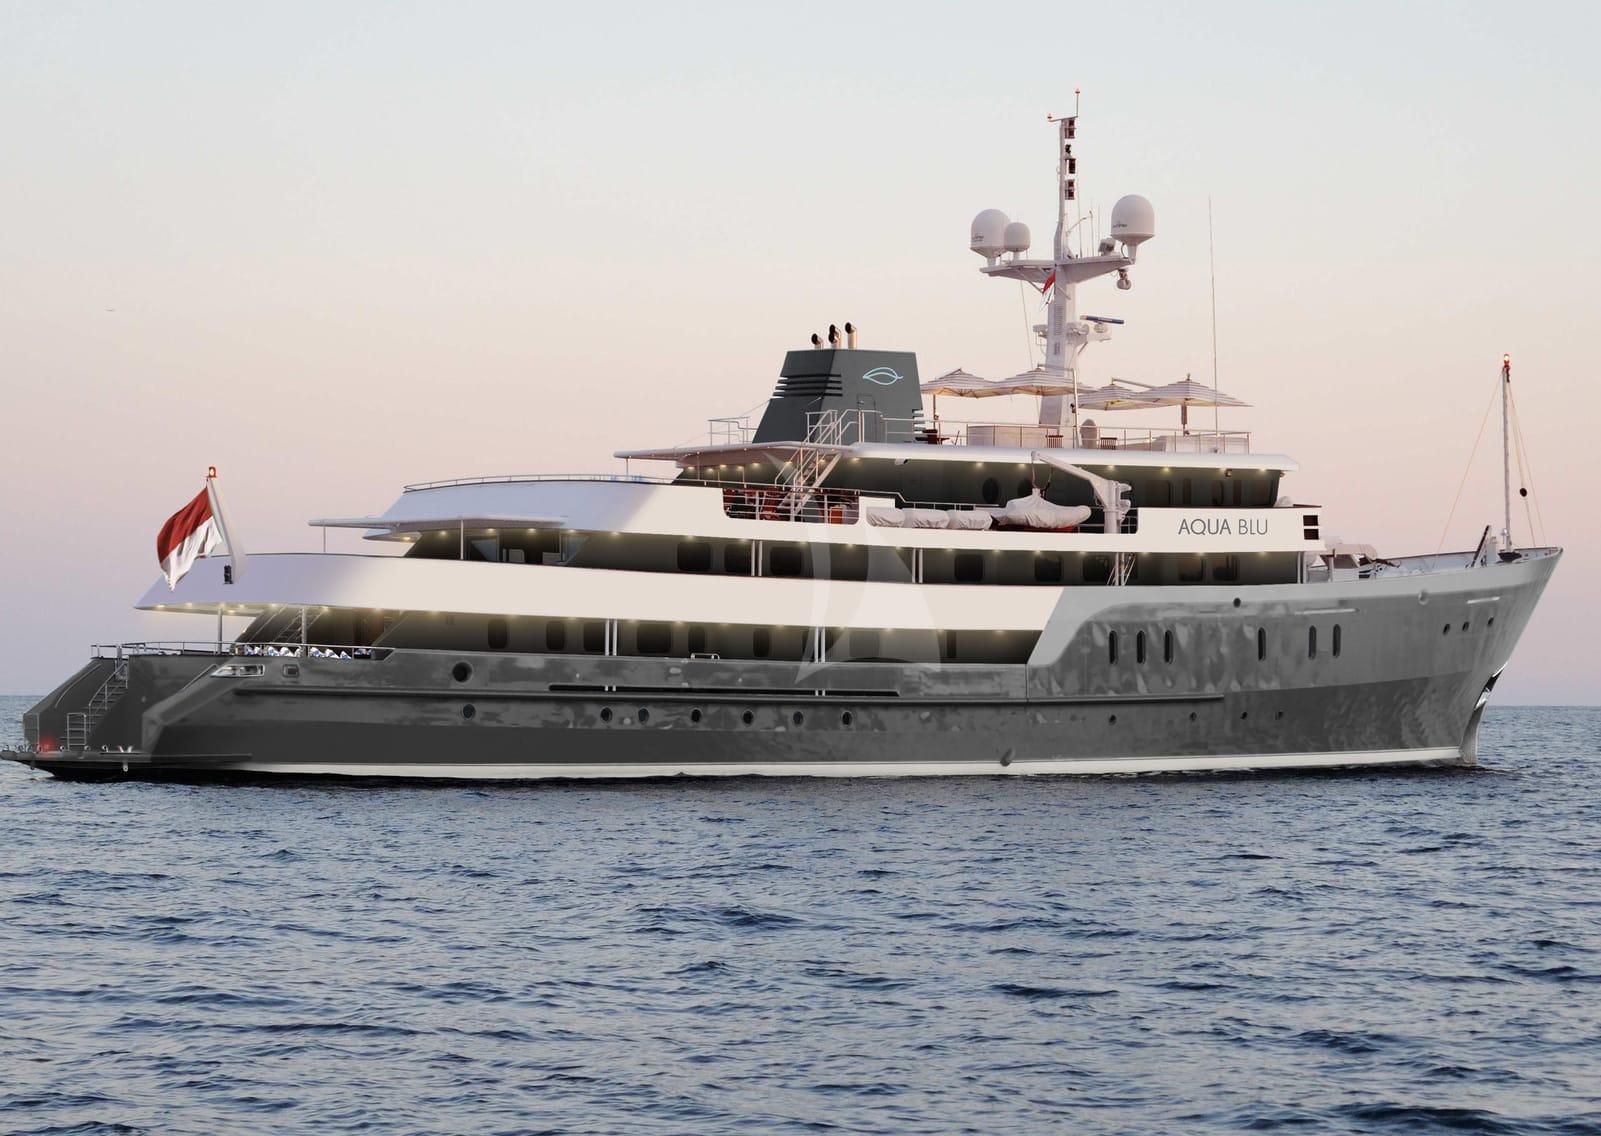 Image of Aqua Blu 60.4M (198.0FT) motor yacht